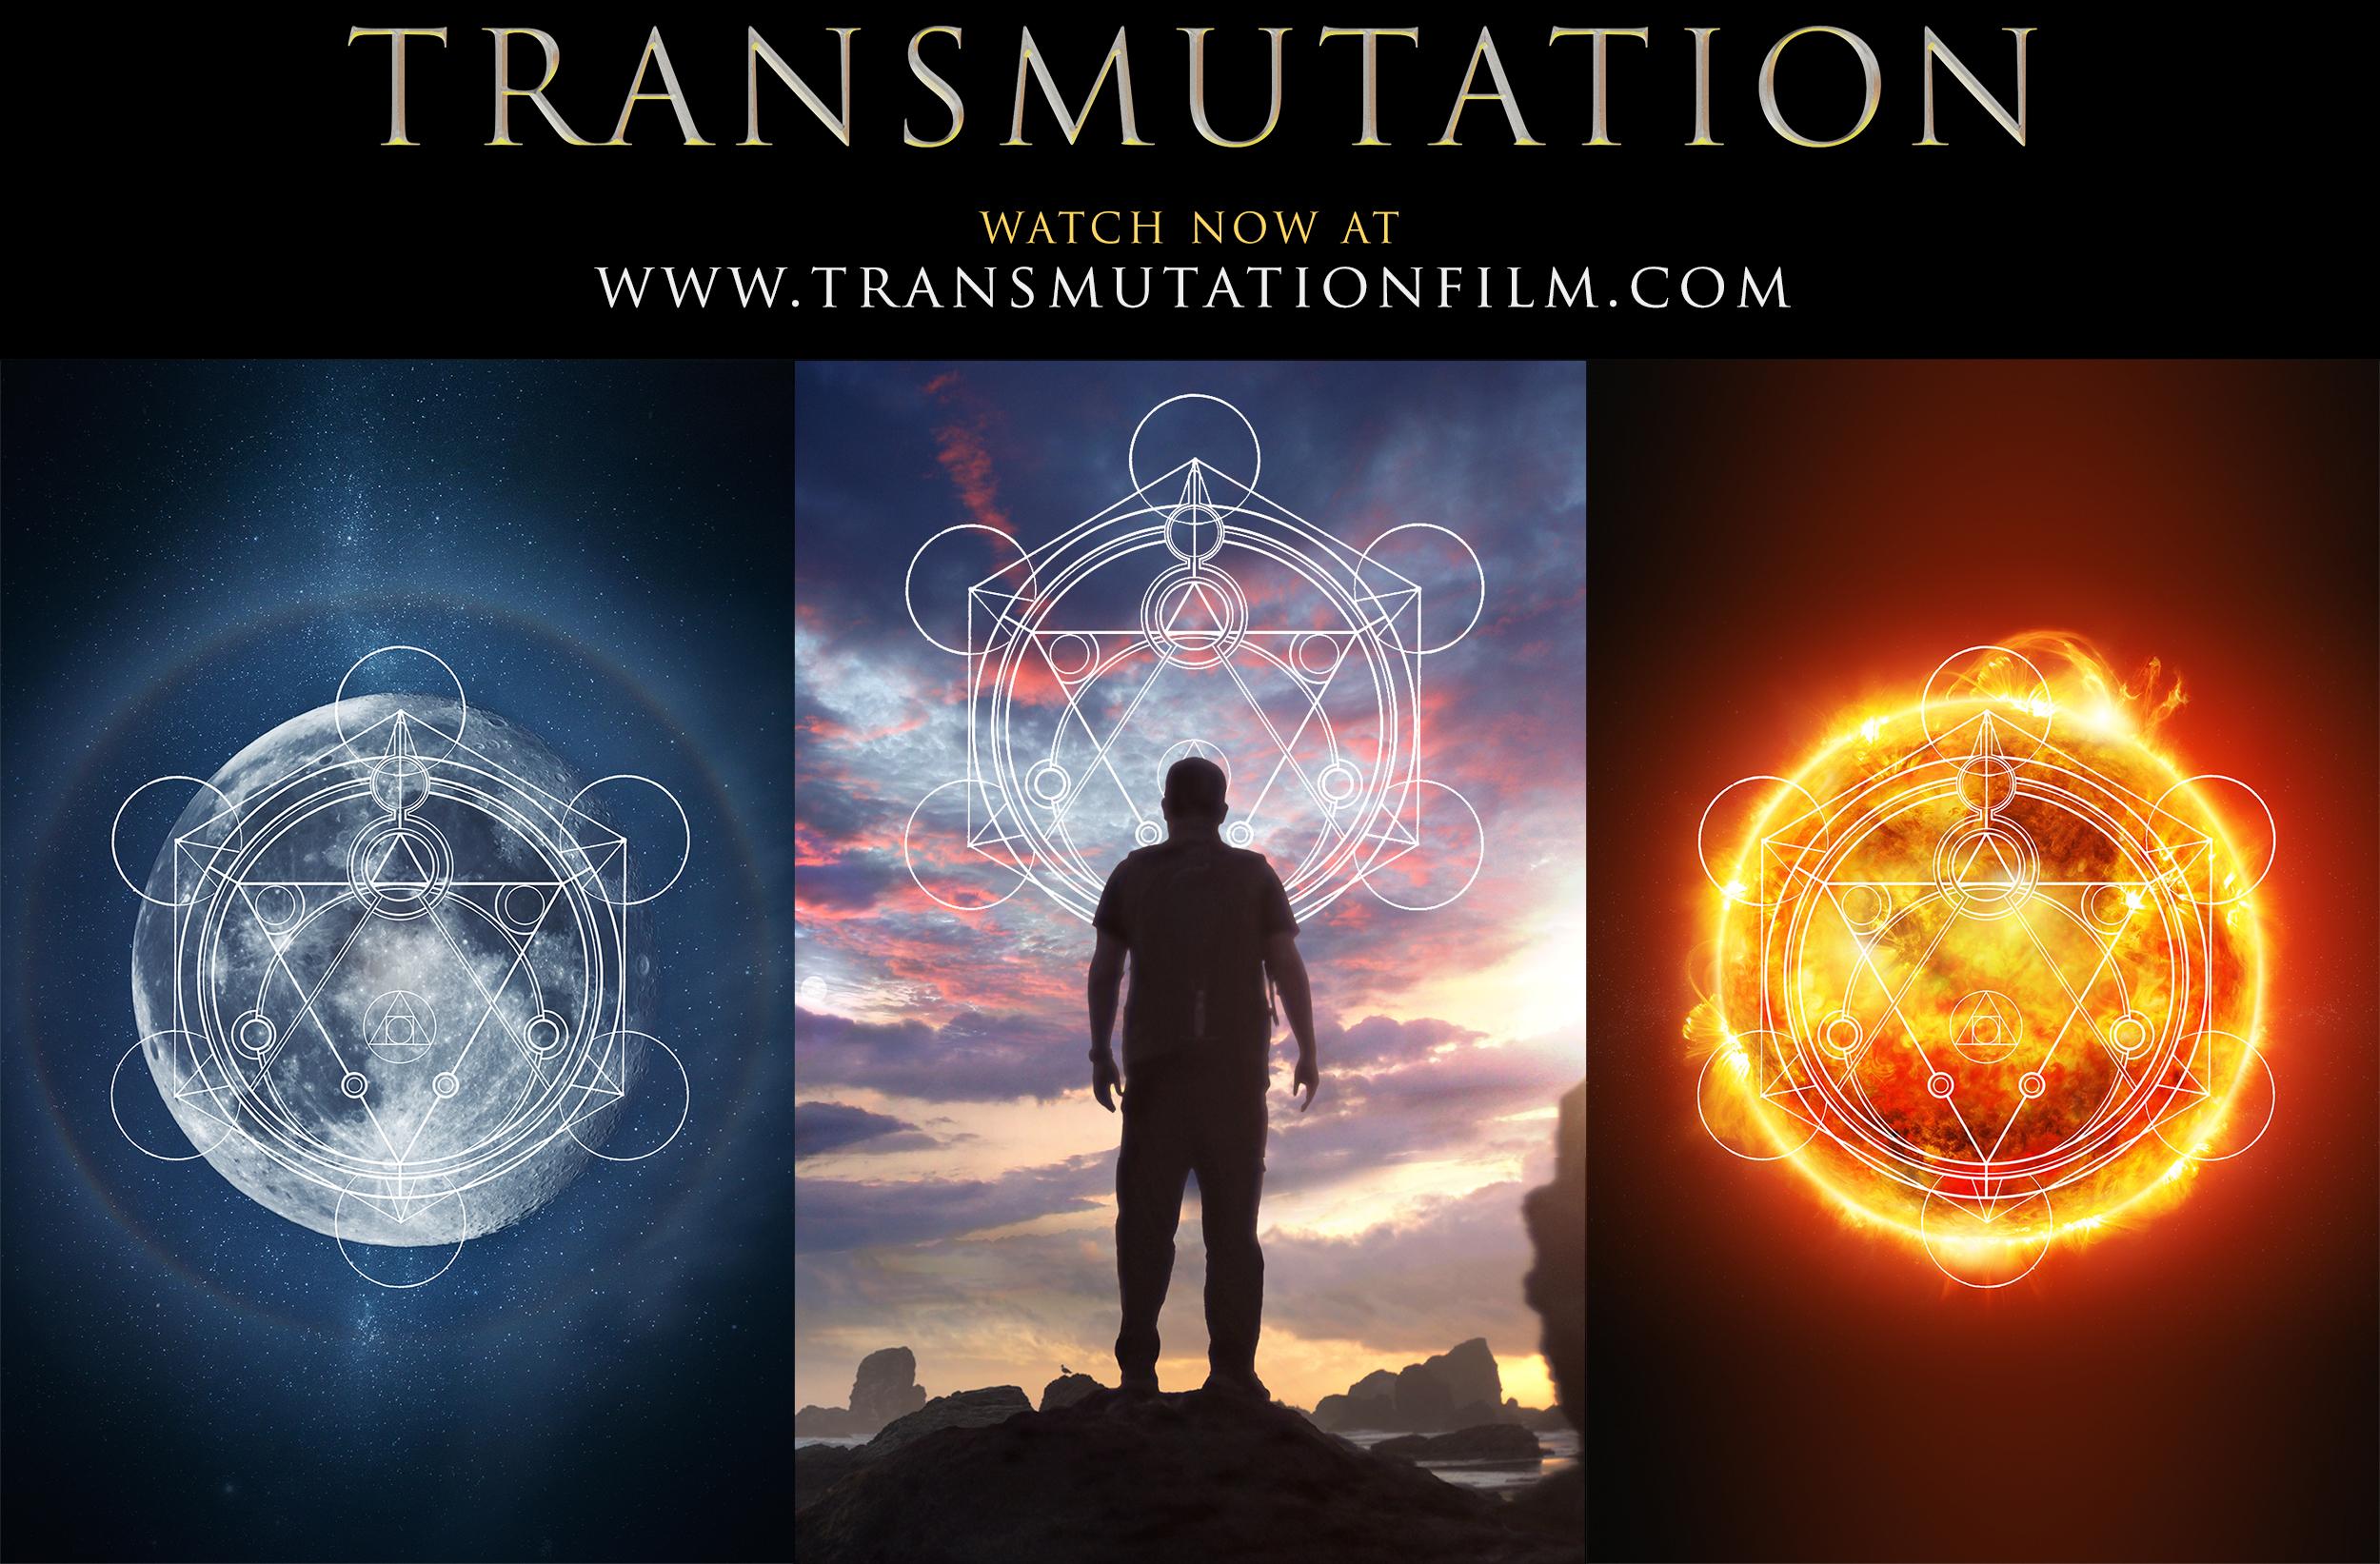 TRANSMUTATION_KramerHeckman_MoonEarthSun_PostersRelease_v008.jpg